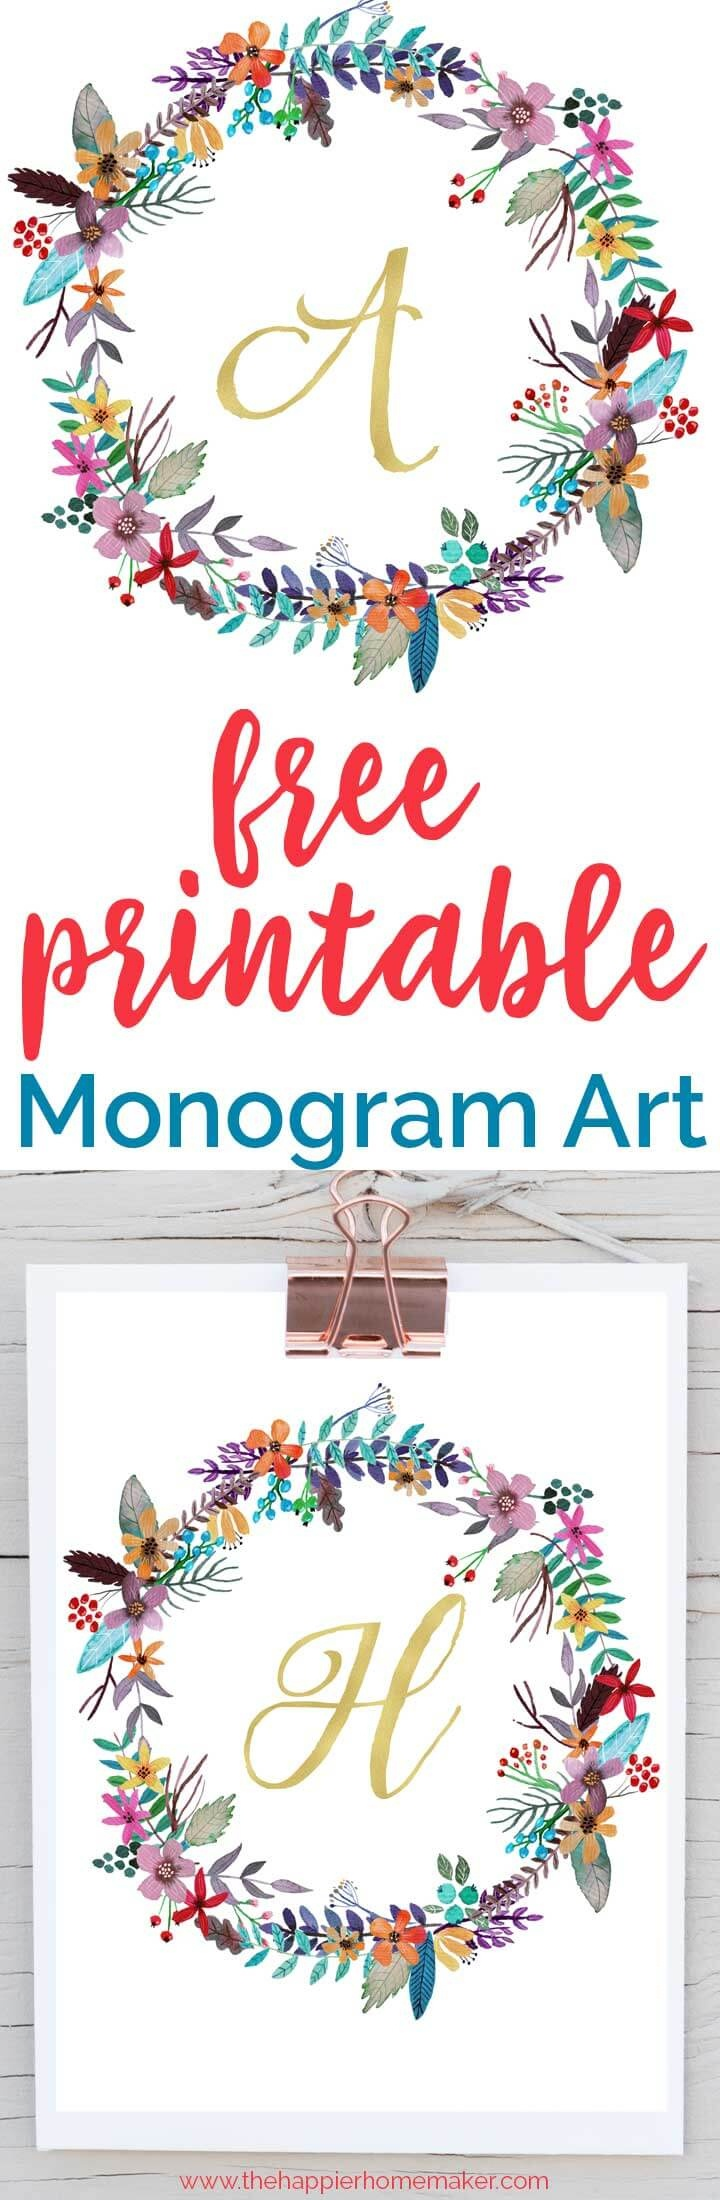 Free Printable Monogram Art | The Happier Homemaker - Free Printable Monogram Letters